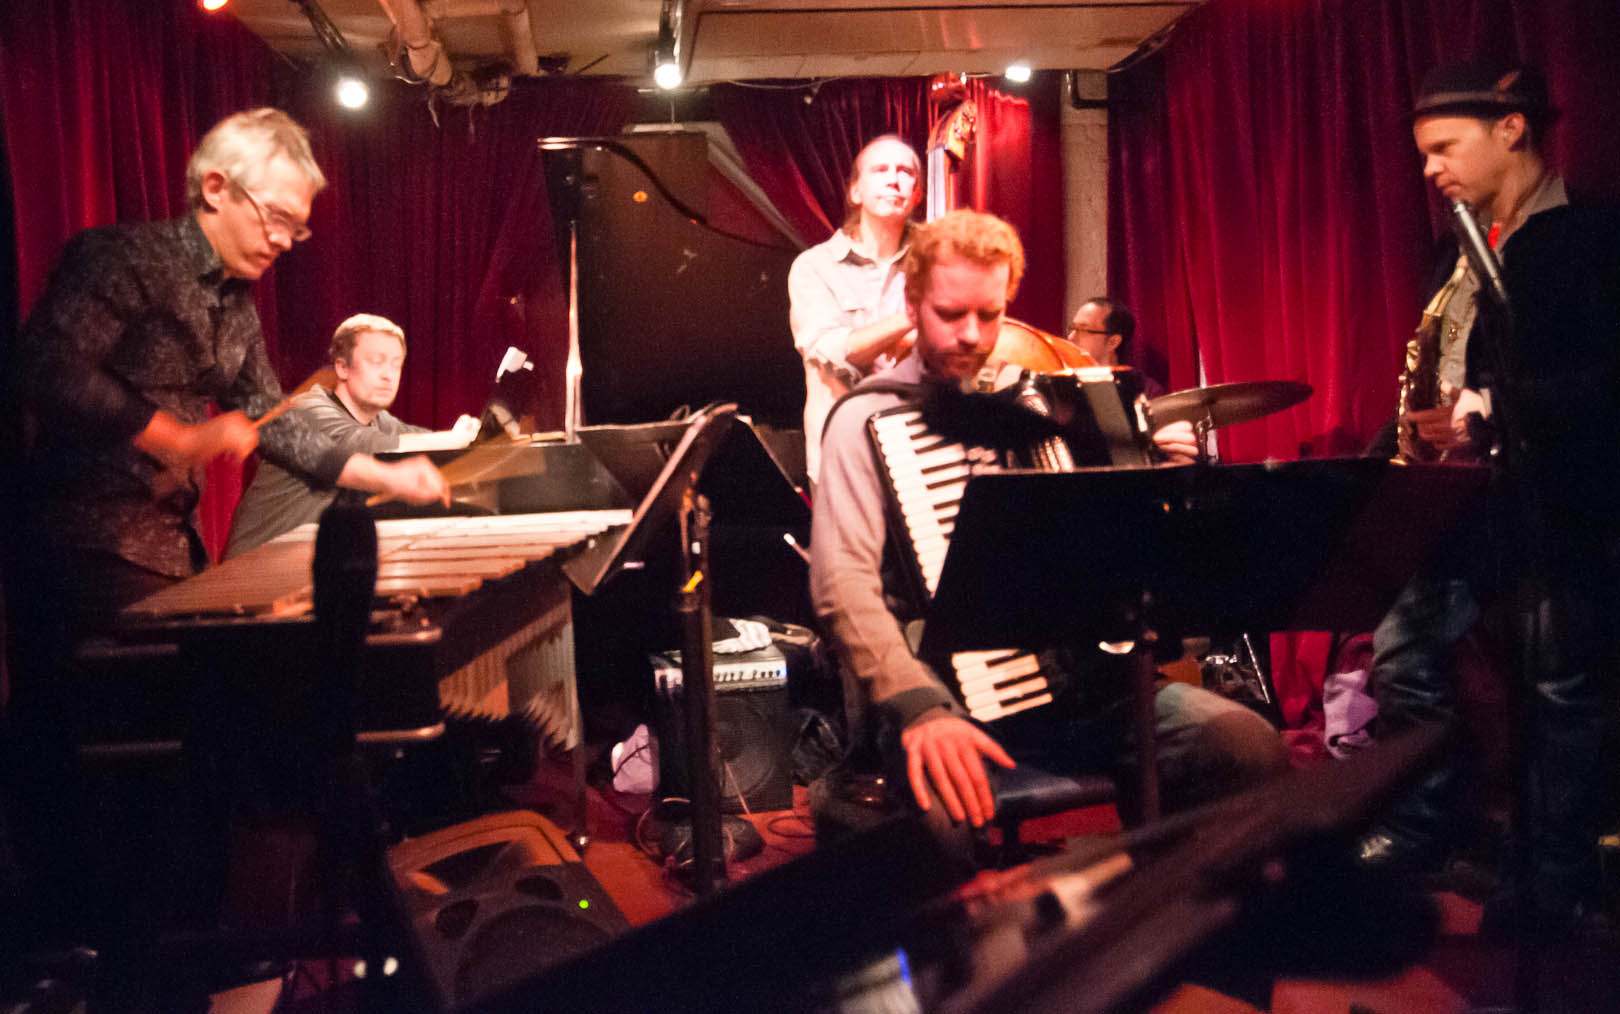 Matt Moran, Matt Mitchell, Red Wieringa, Drew Gress and Chris Speed with the Claudia Quintet at the Cornelia Street Cafe